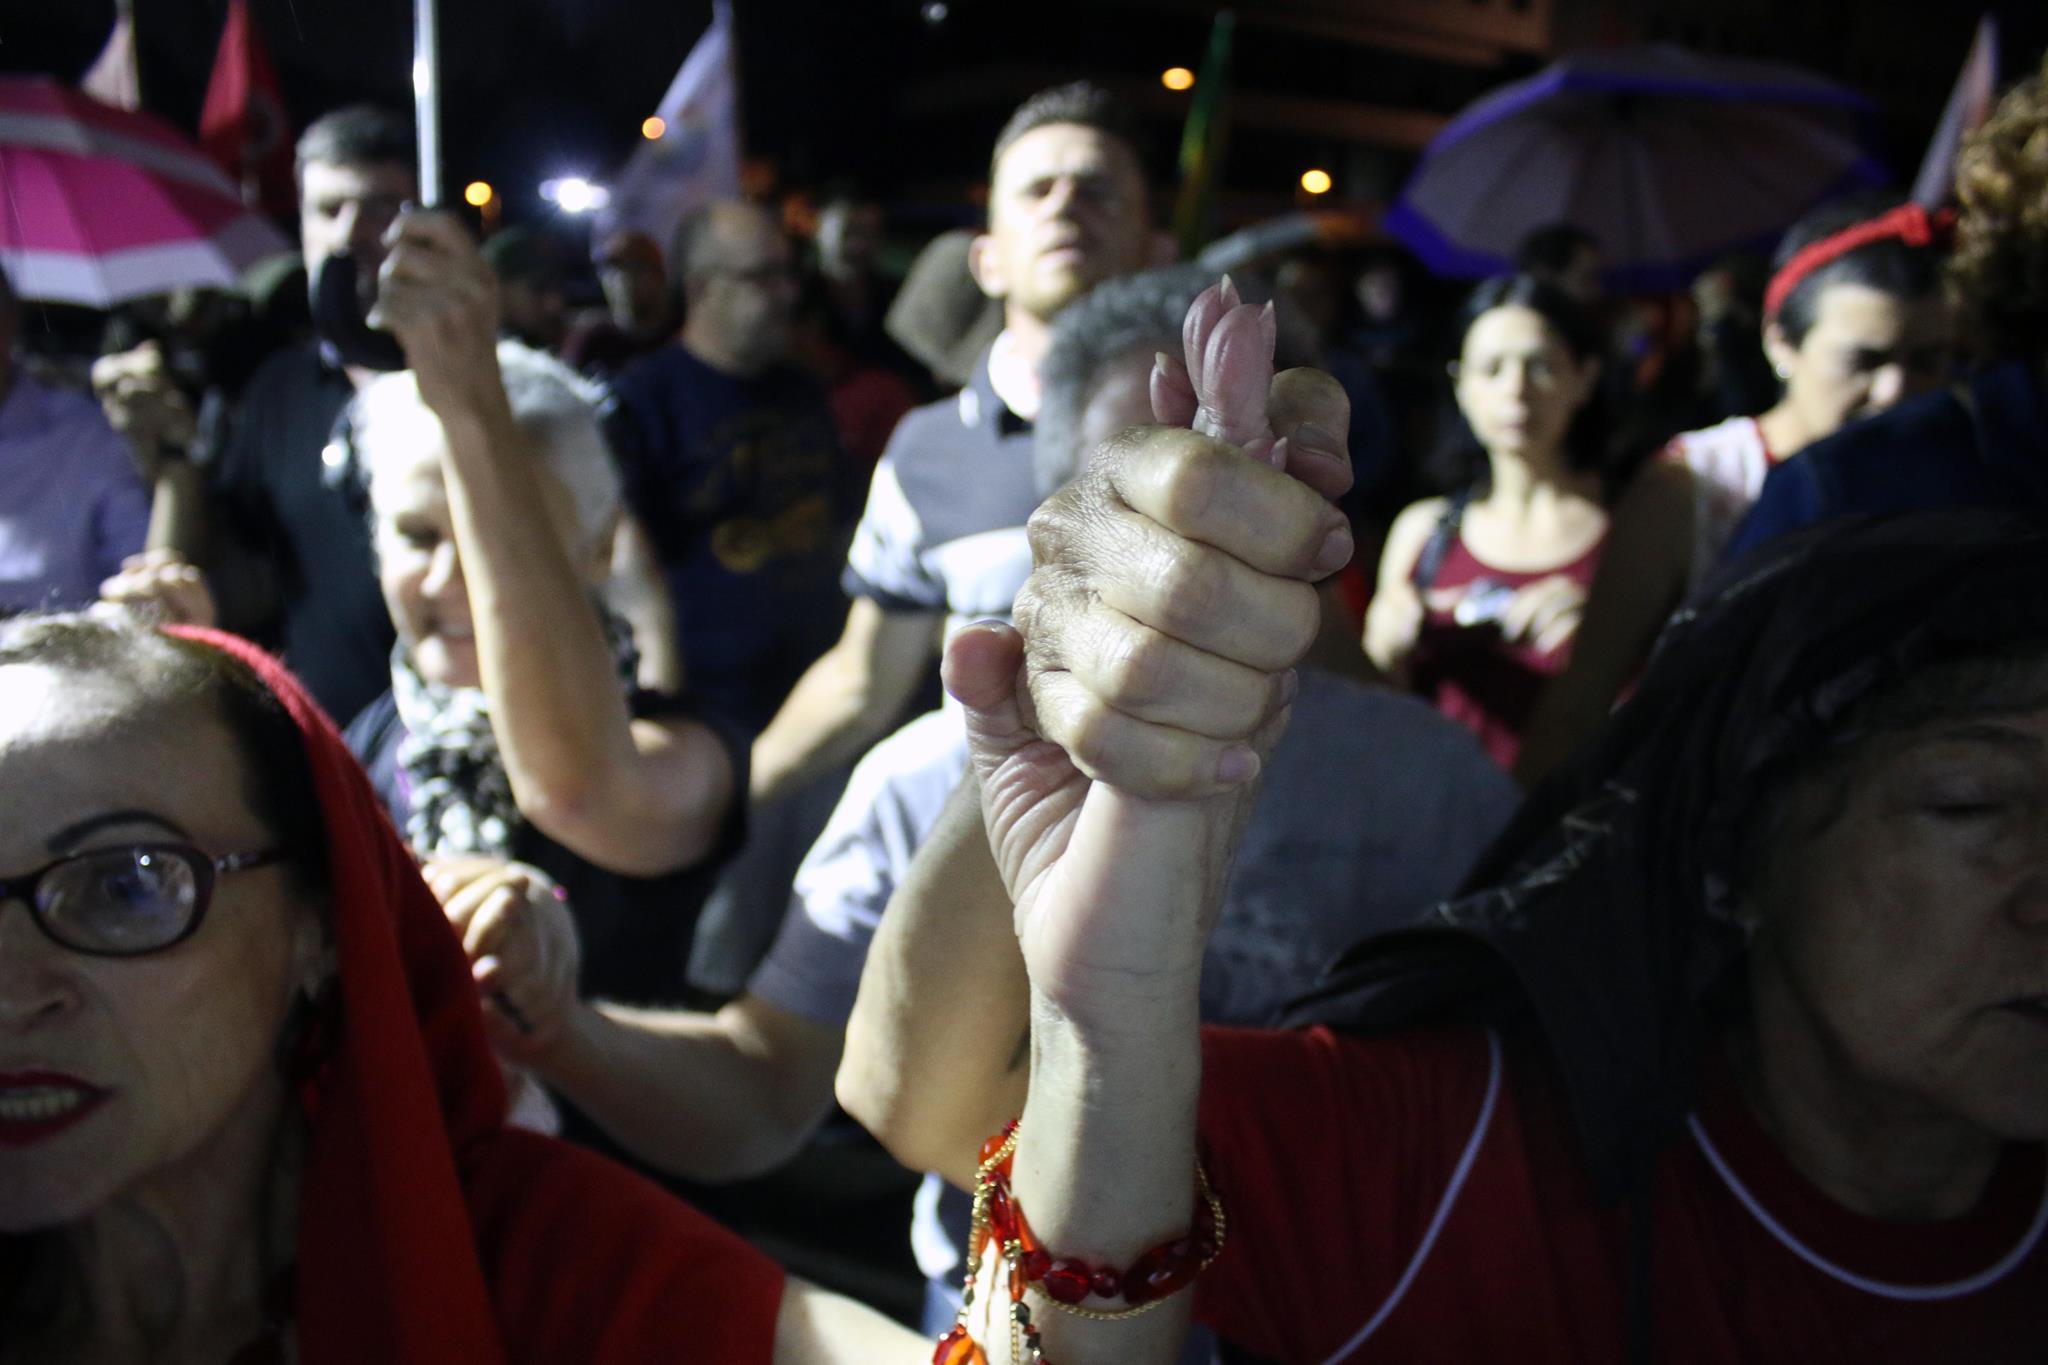 FOTO27-Jornalistas Livres